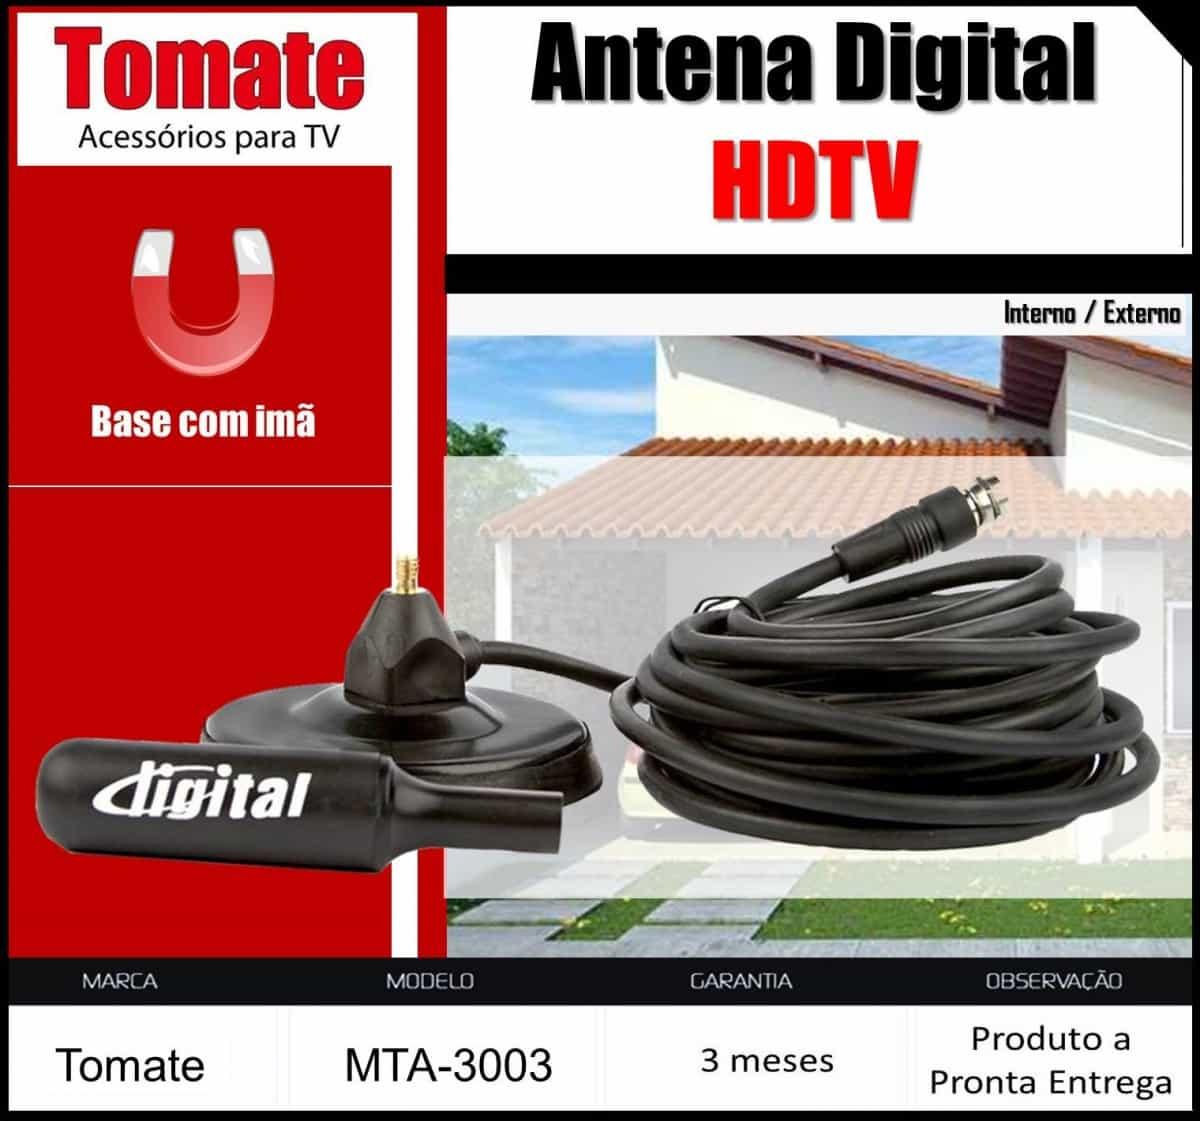 Foto2 - Antena Interna Digital (MTA-3003) HDTV Tomate